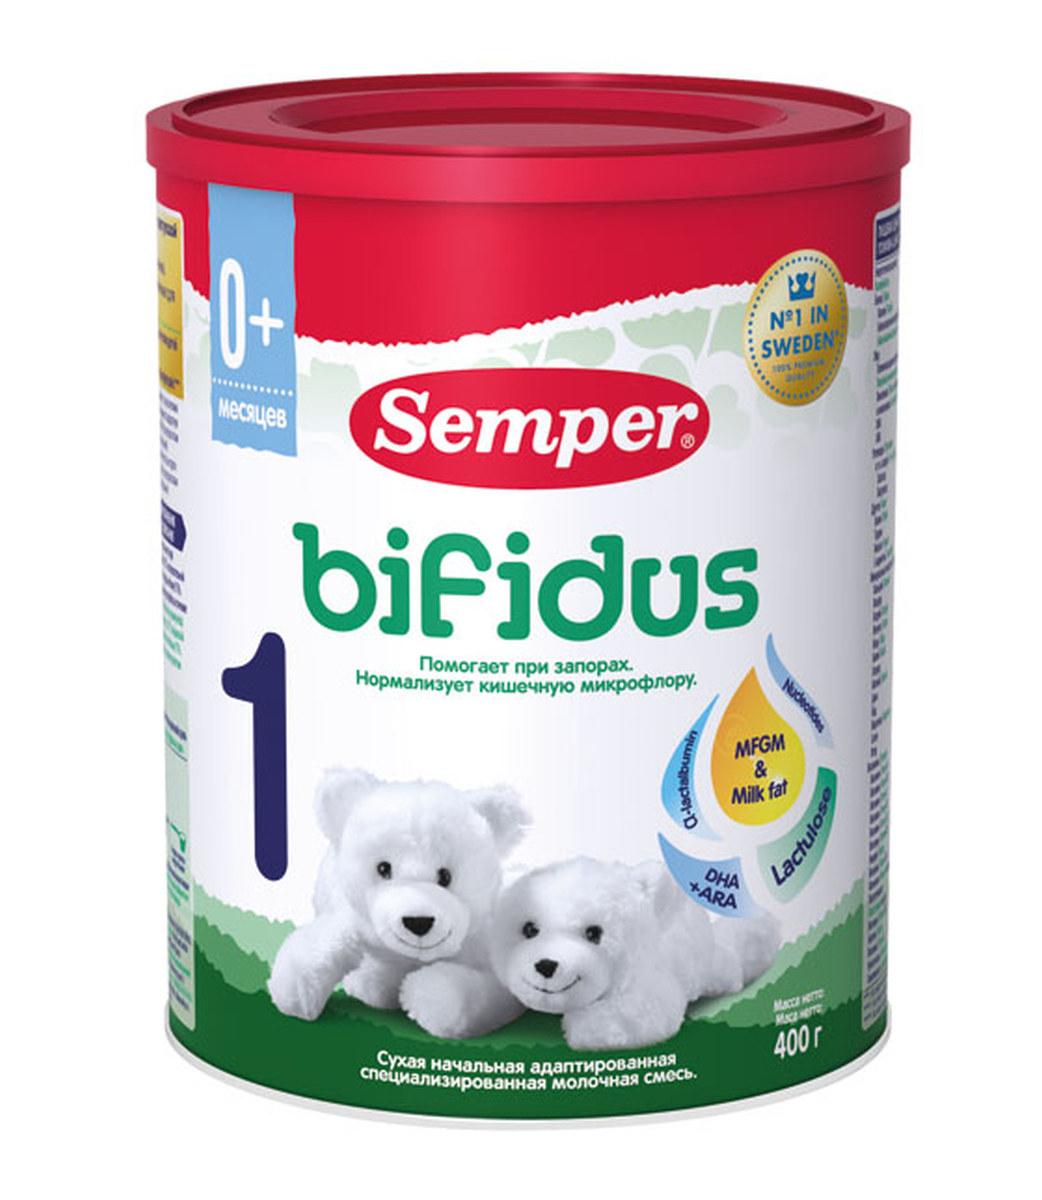 Semper Bifidus 1 смесь молочная с 0 месяцев, 400 г semper baby bifidus nutradefense 2 молочная смесь с 6 мес 400 гр